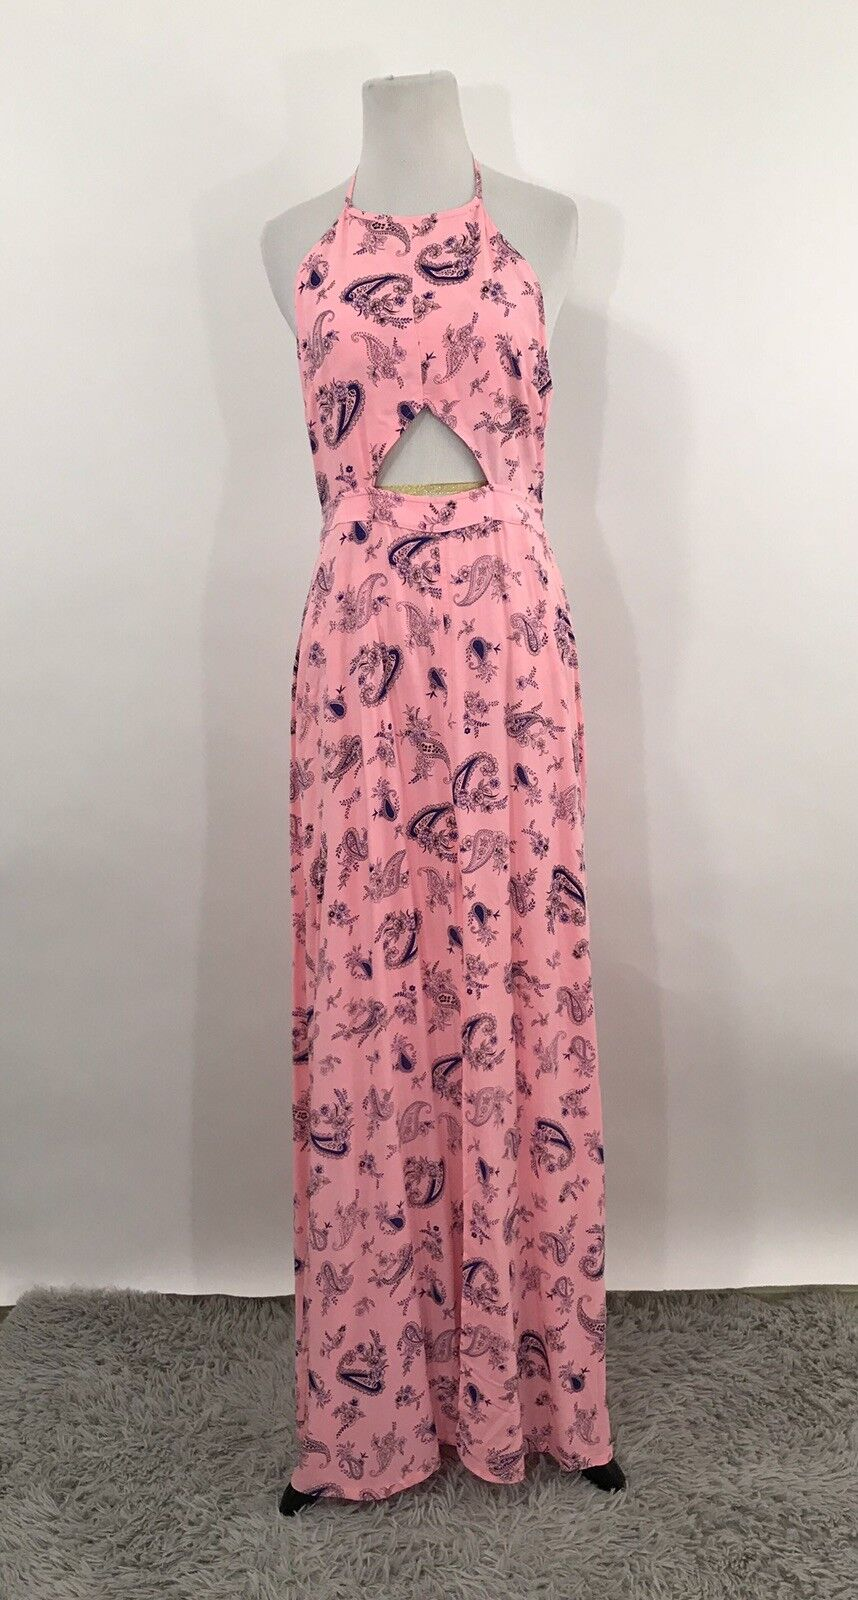 Wildfox Women's Liberty Paisley Print Maxi Dress Pink S